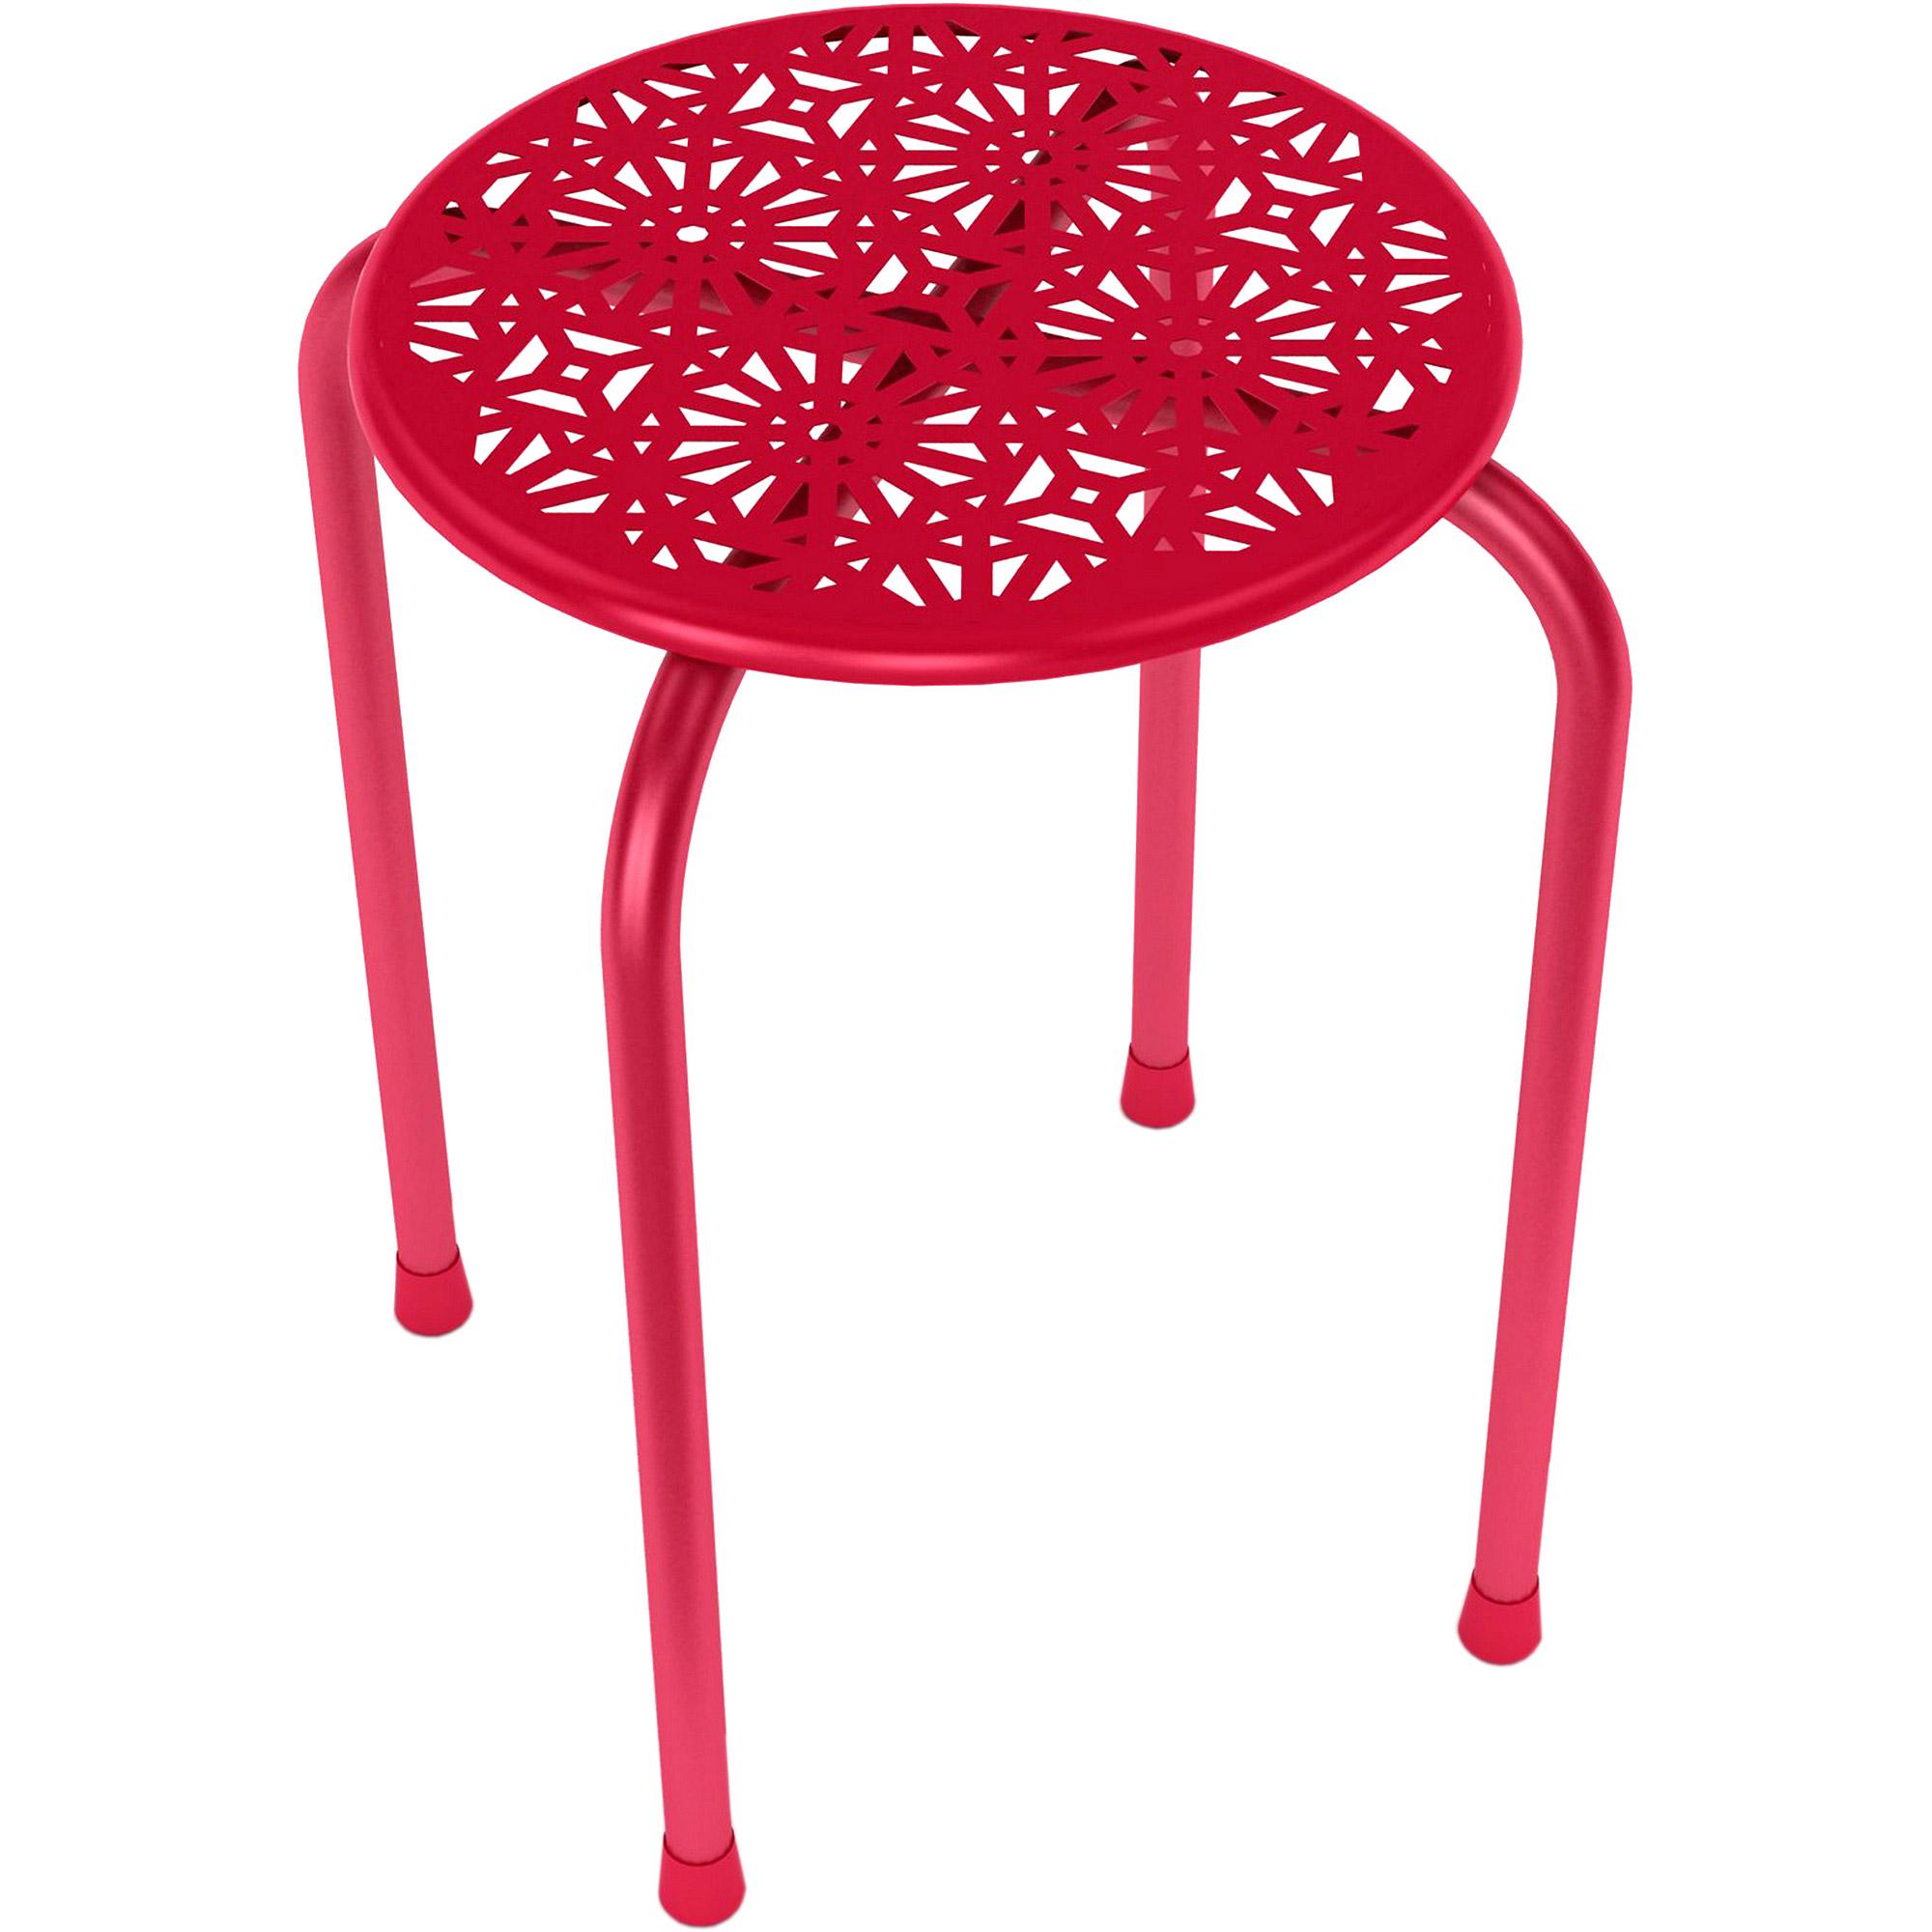 Atlantic Daisy Metal Side Table/Stool, Set Of 2, Multiple Colors    Walmart.com